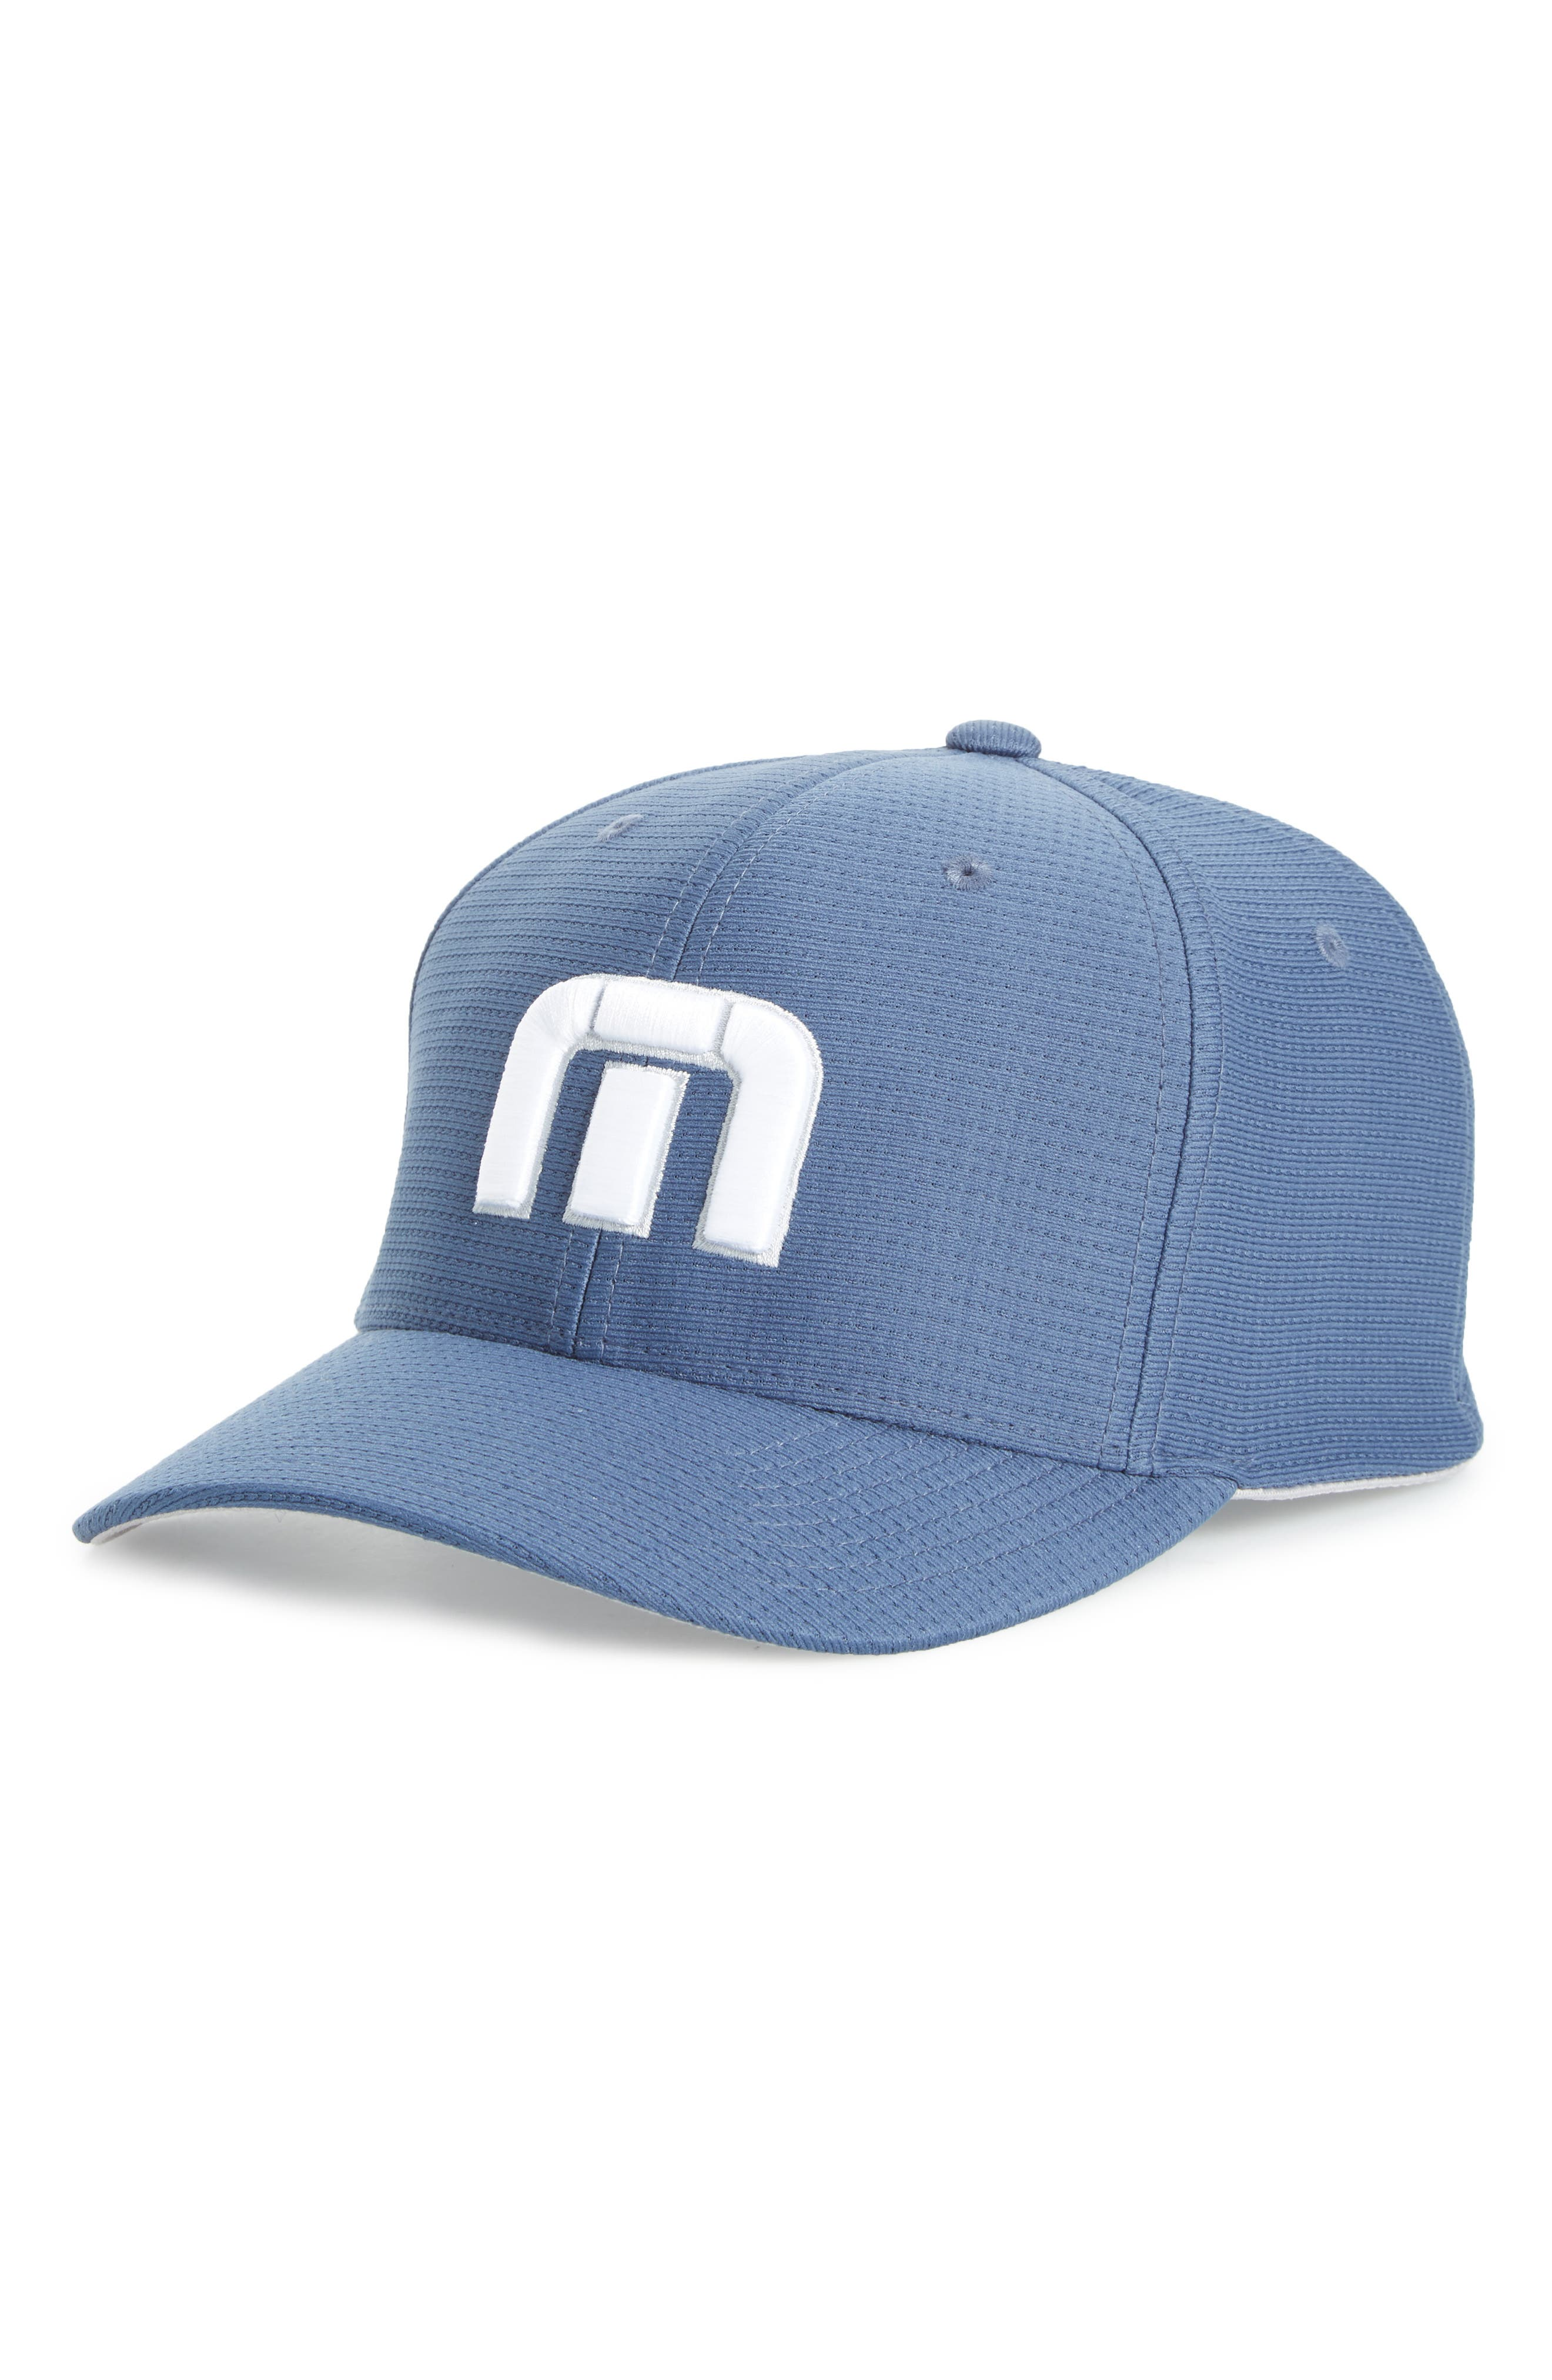 Alternate Image 1 Selected - Travis Mathew 'B-Bahamas' Hat